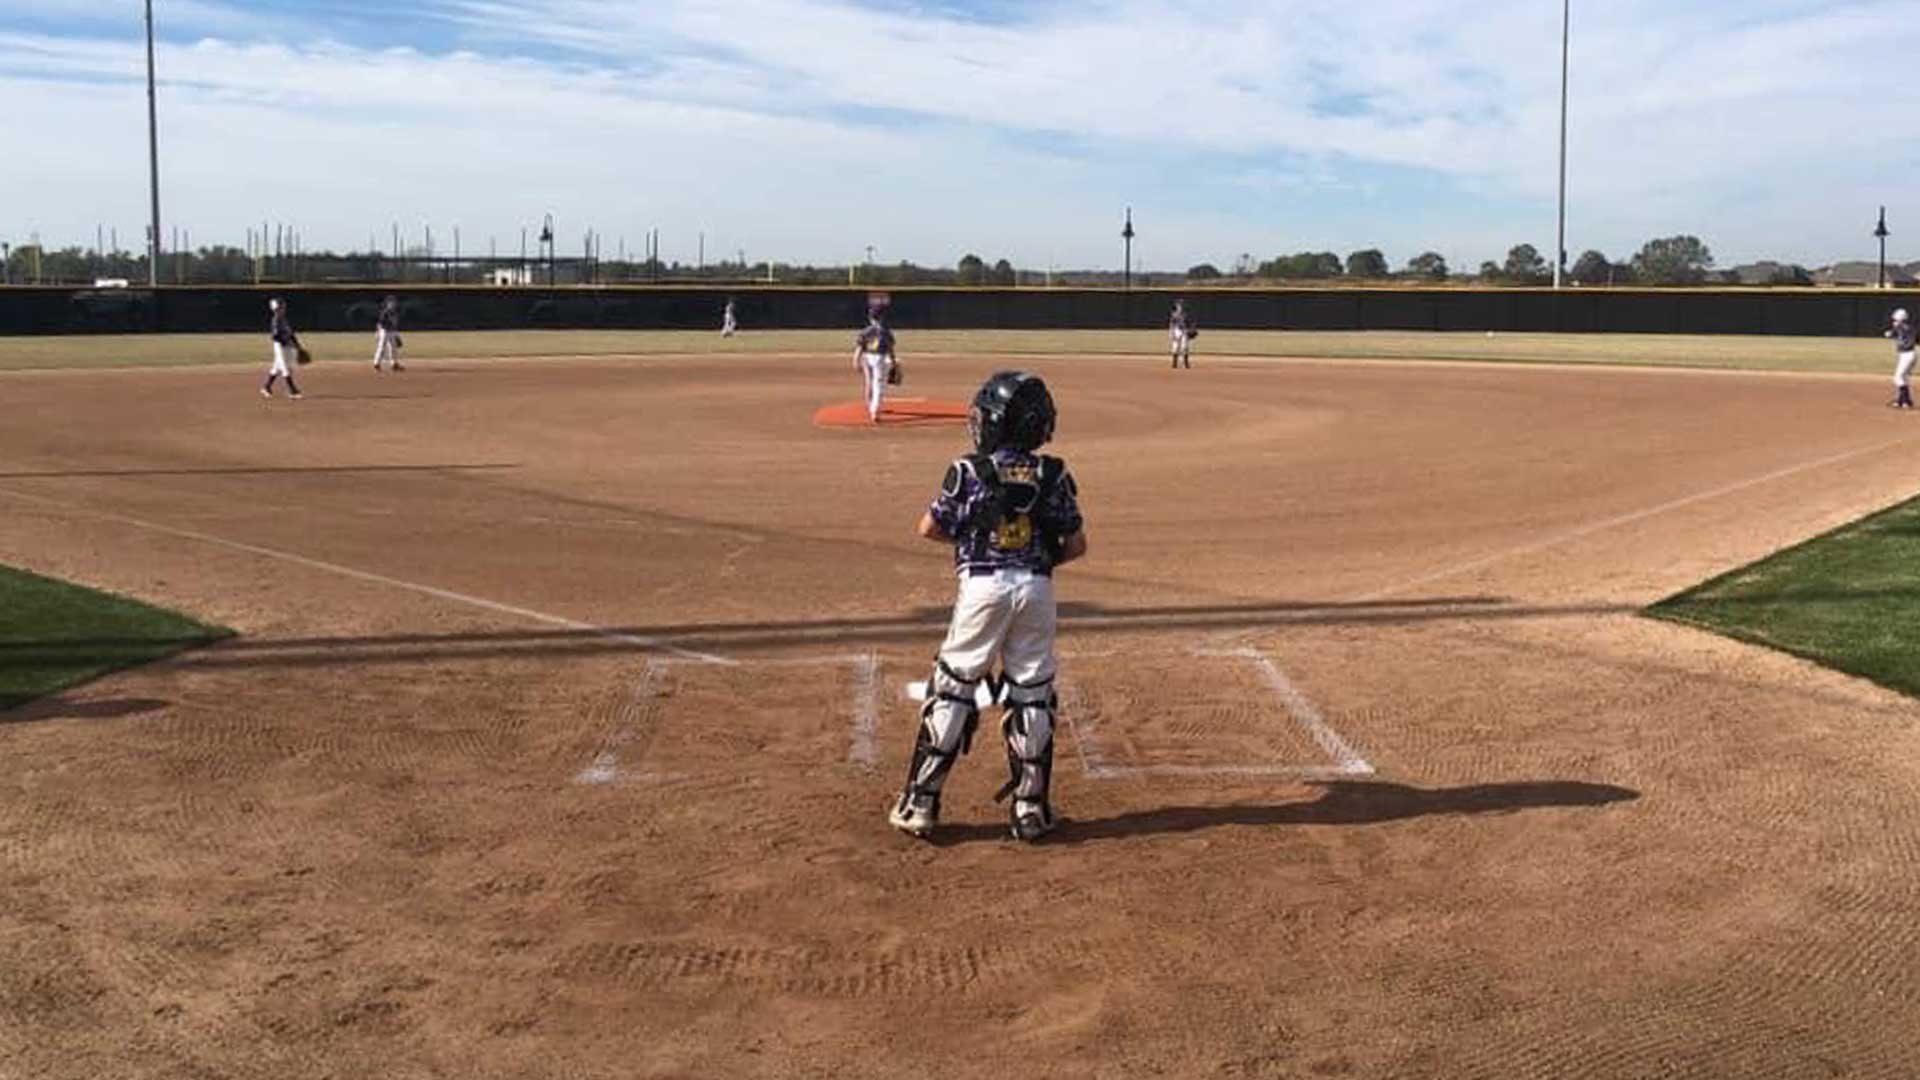 Photo of softball complex field configured for baseball.